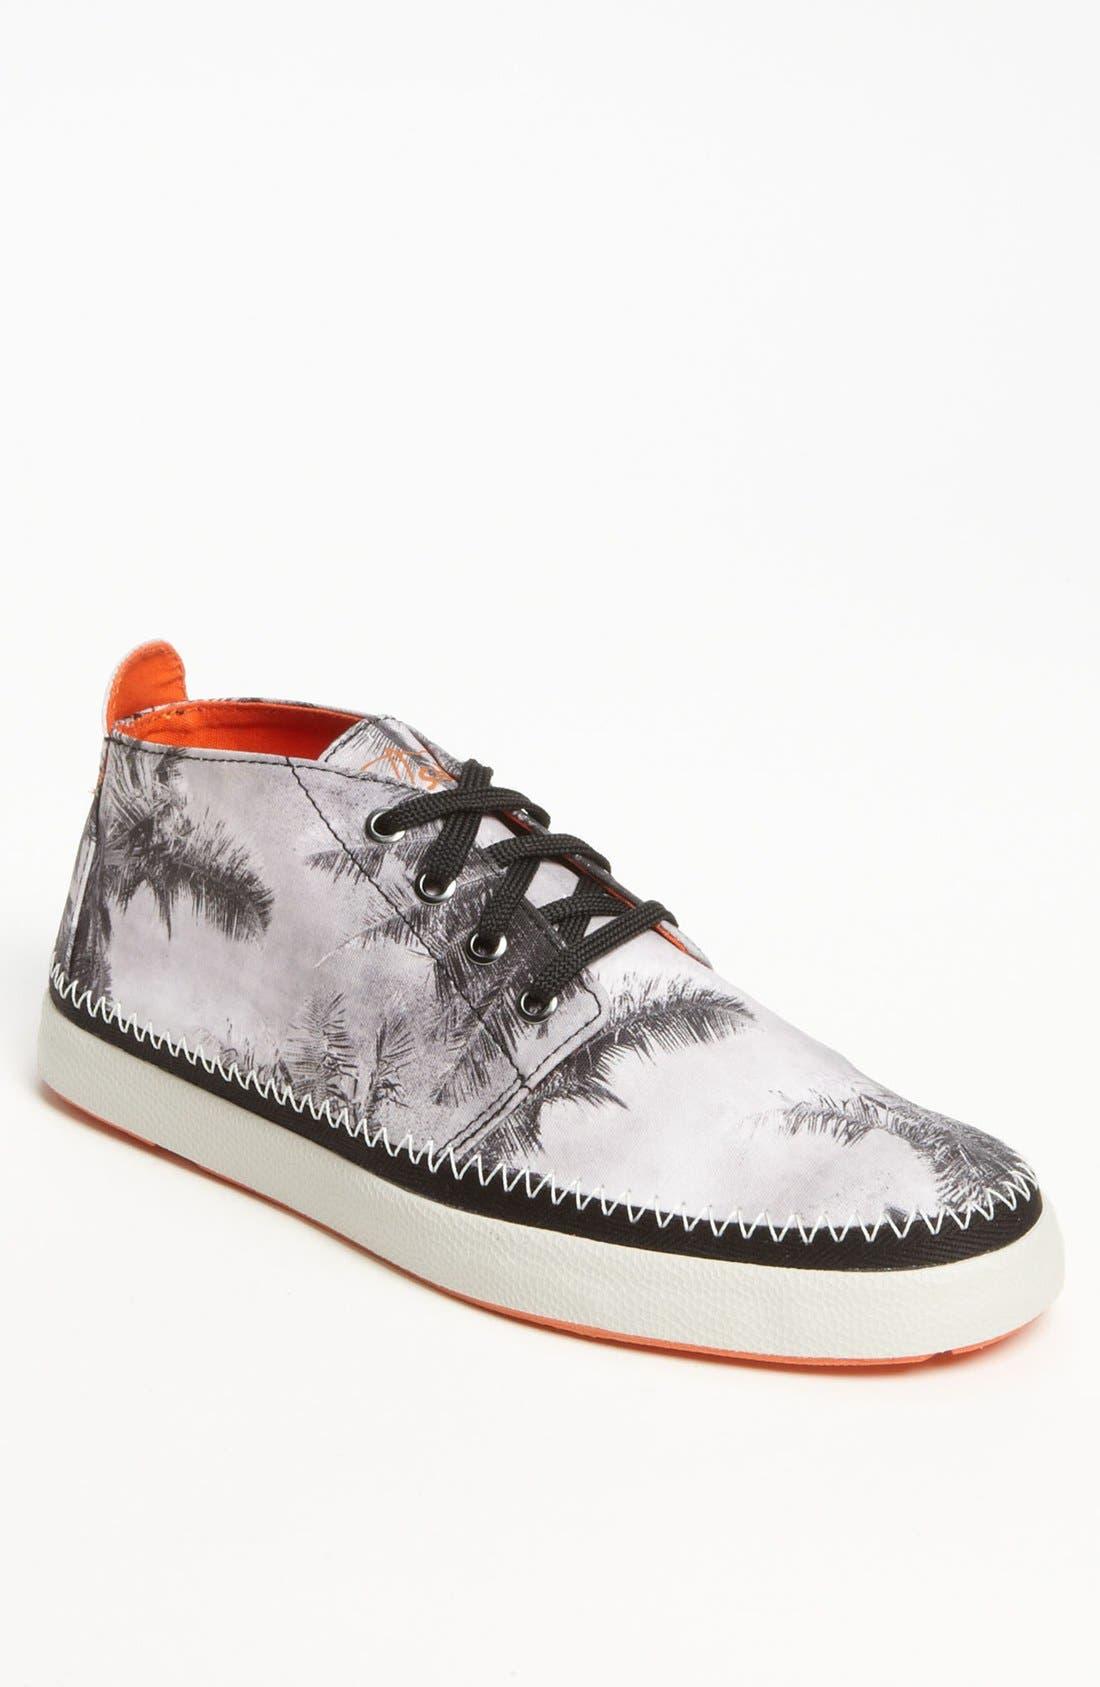 Top-Sider<sup>®</sup> 'Drifter' Chukka Boot,                         Main,                         color, 006